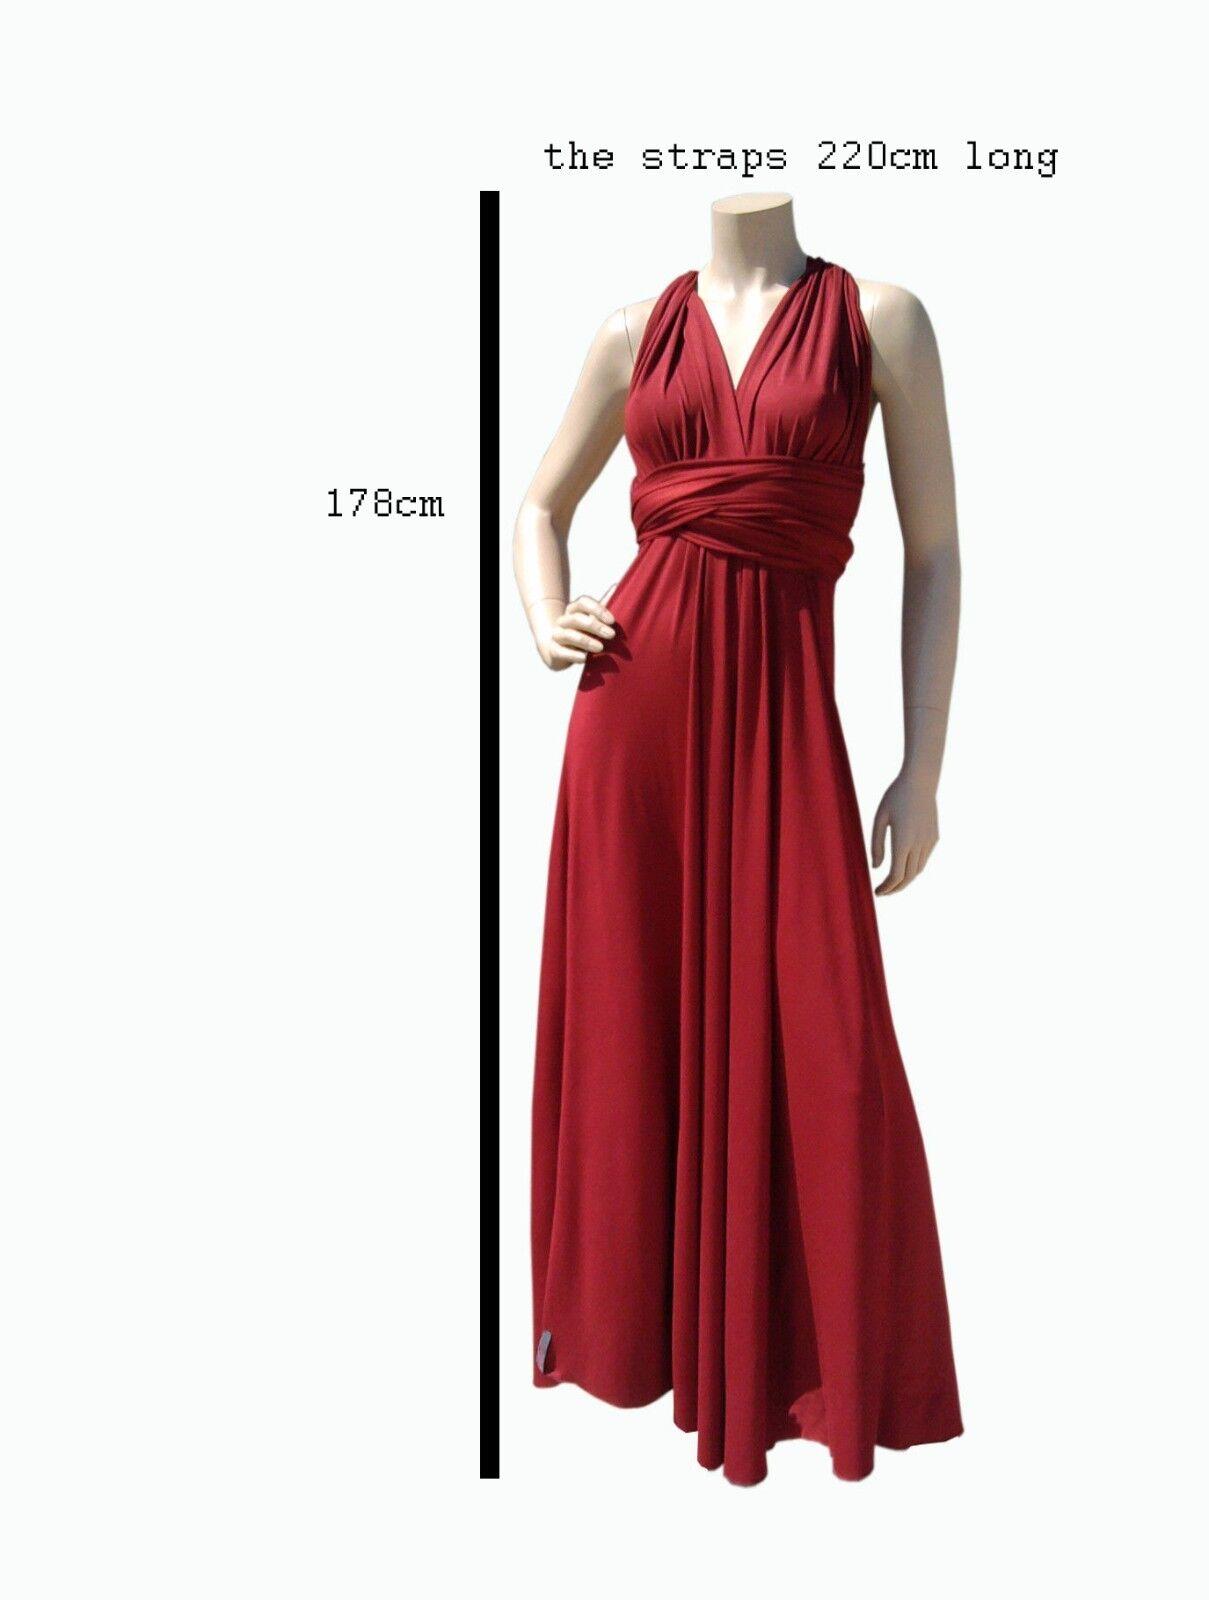 ElenK 129.00  congreenible congreenible congreenible multy way infinity dress silky a6cd94